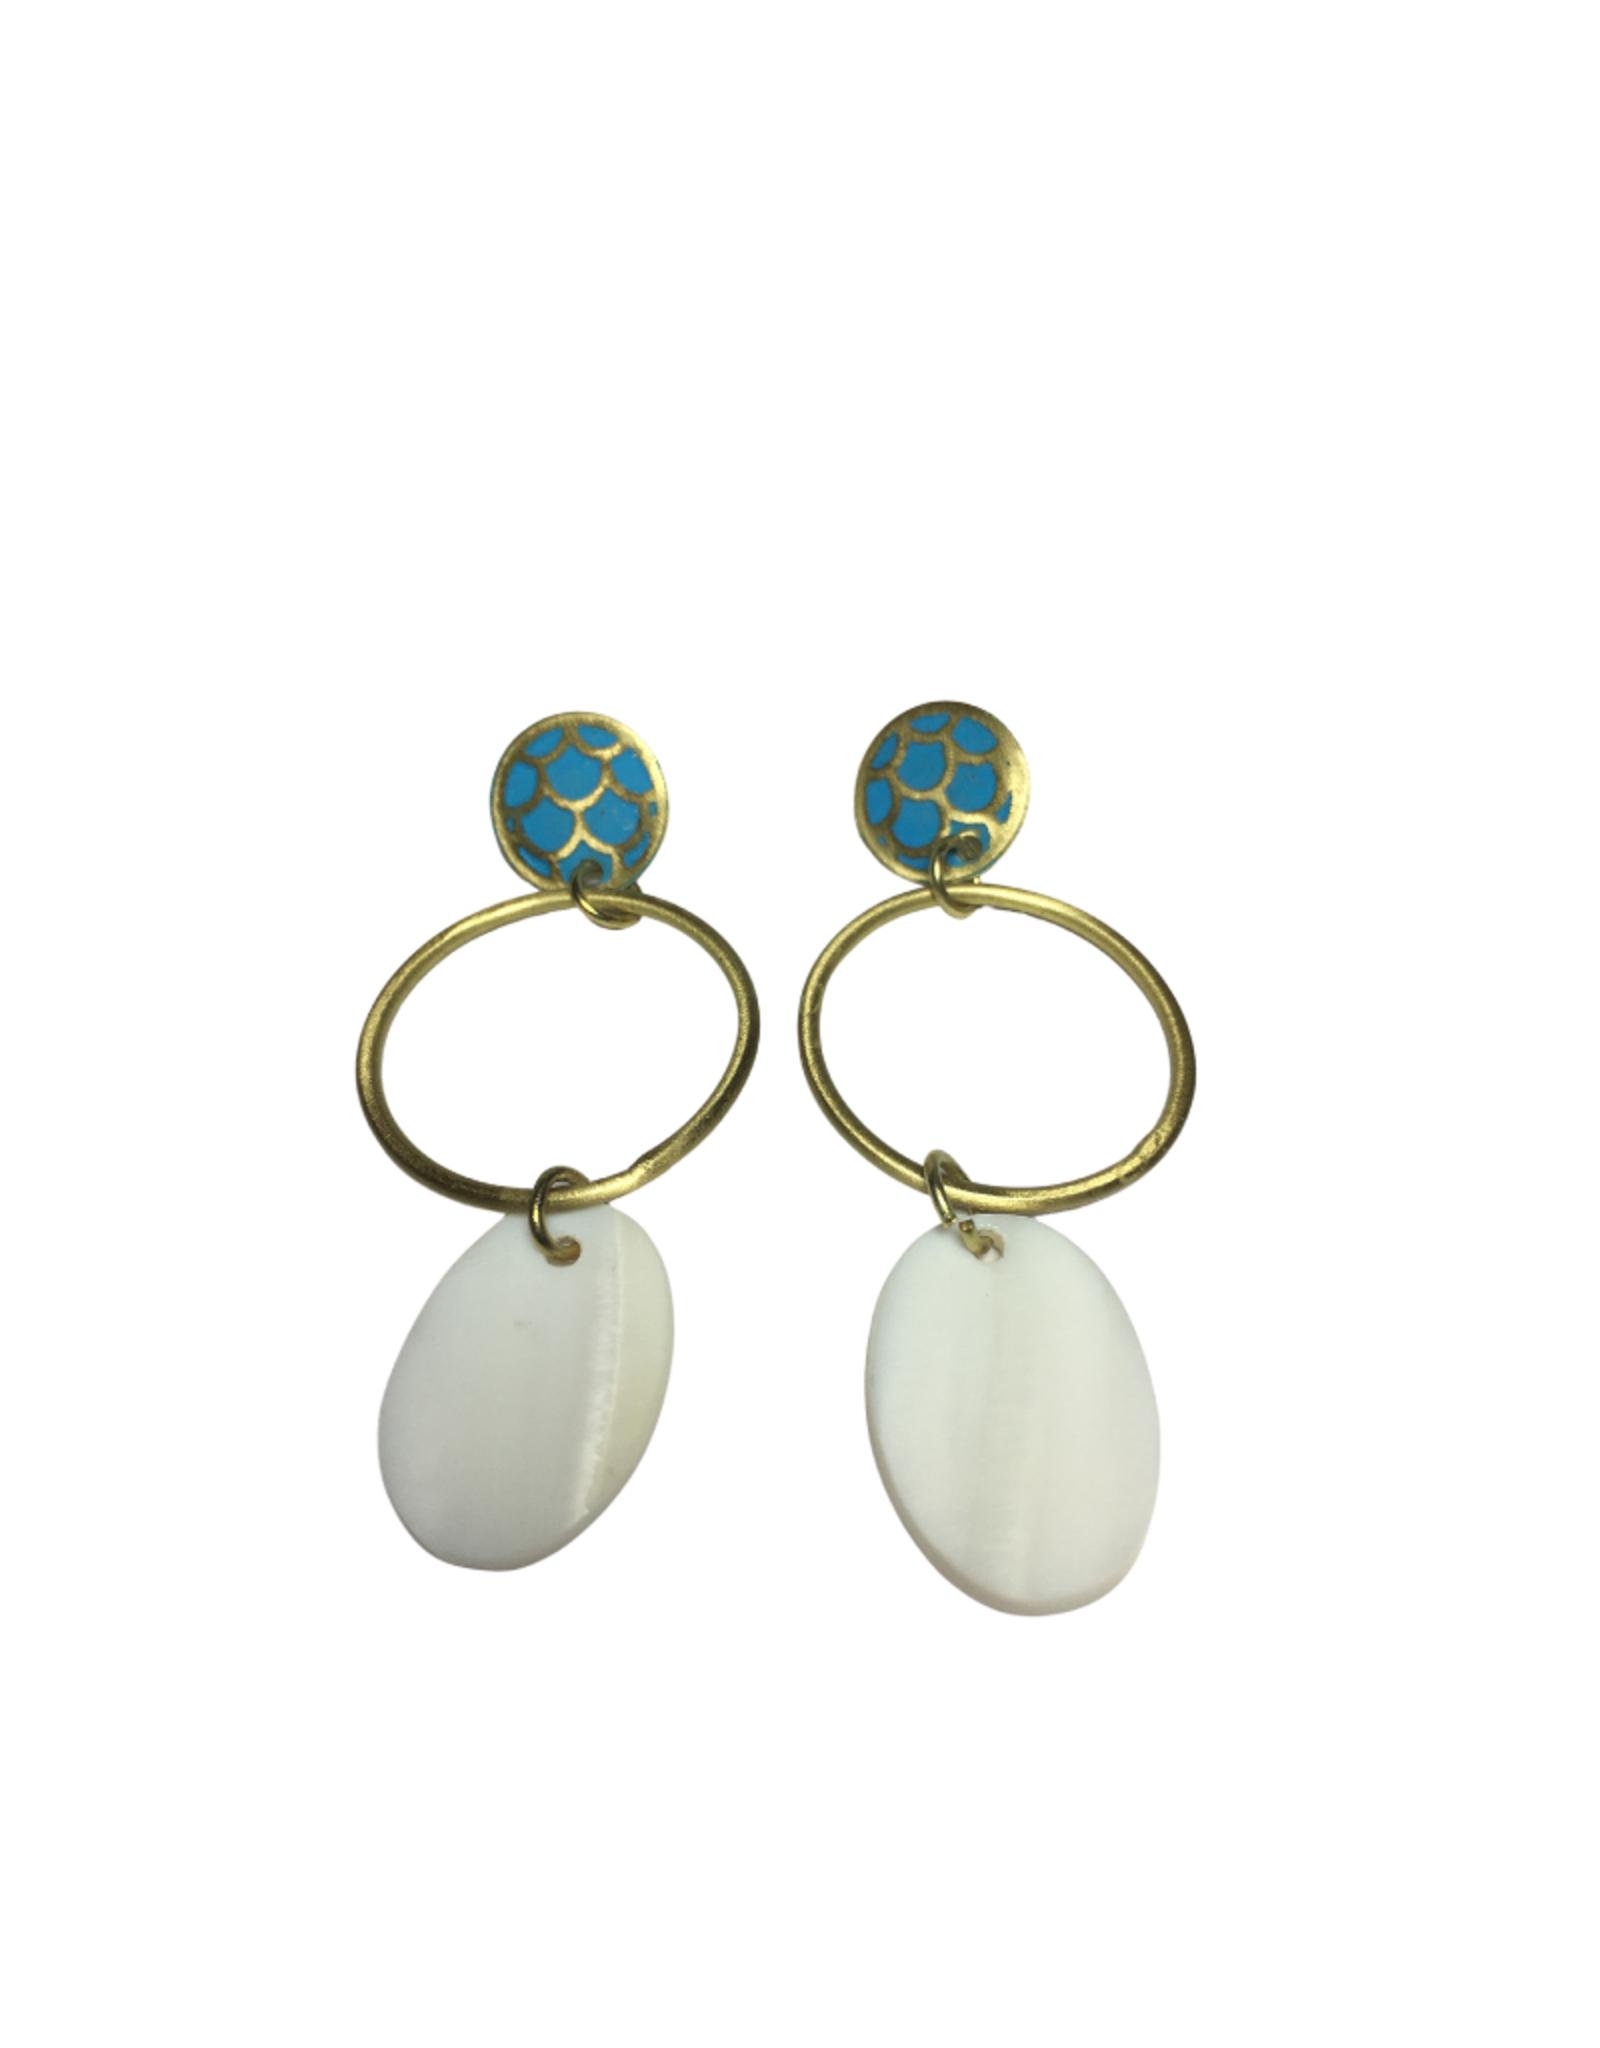 Global Crafts Mother of Pearl Teal Earrings